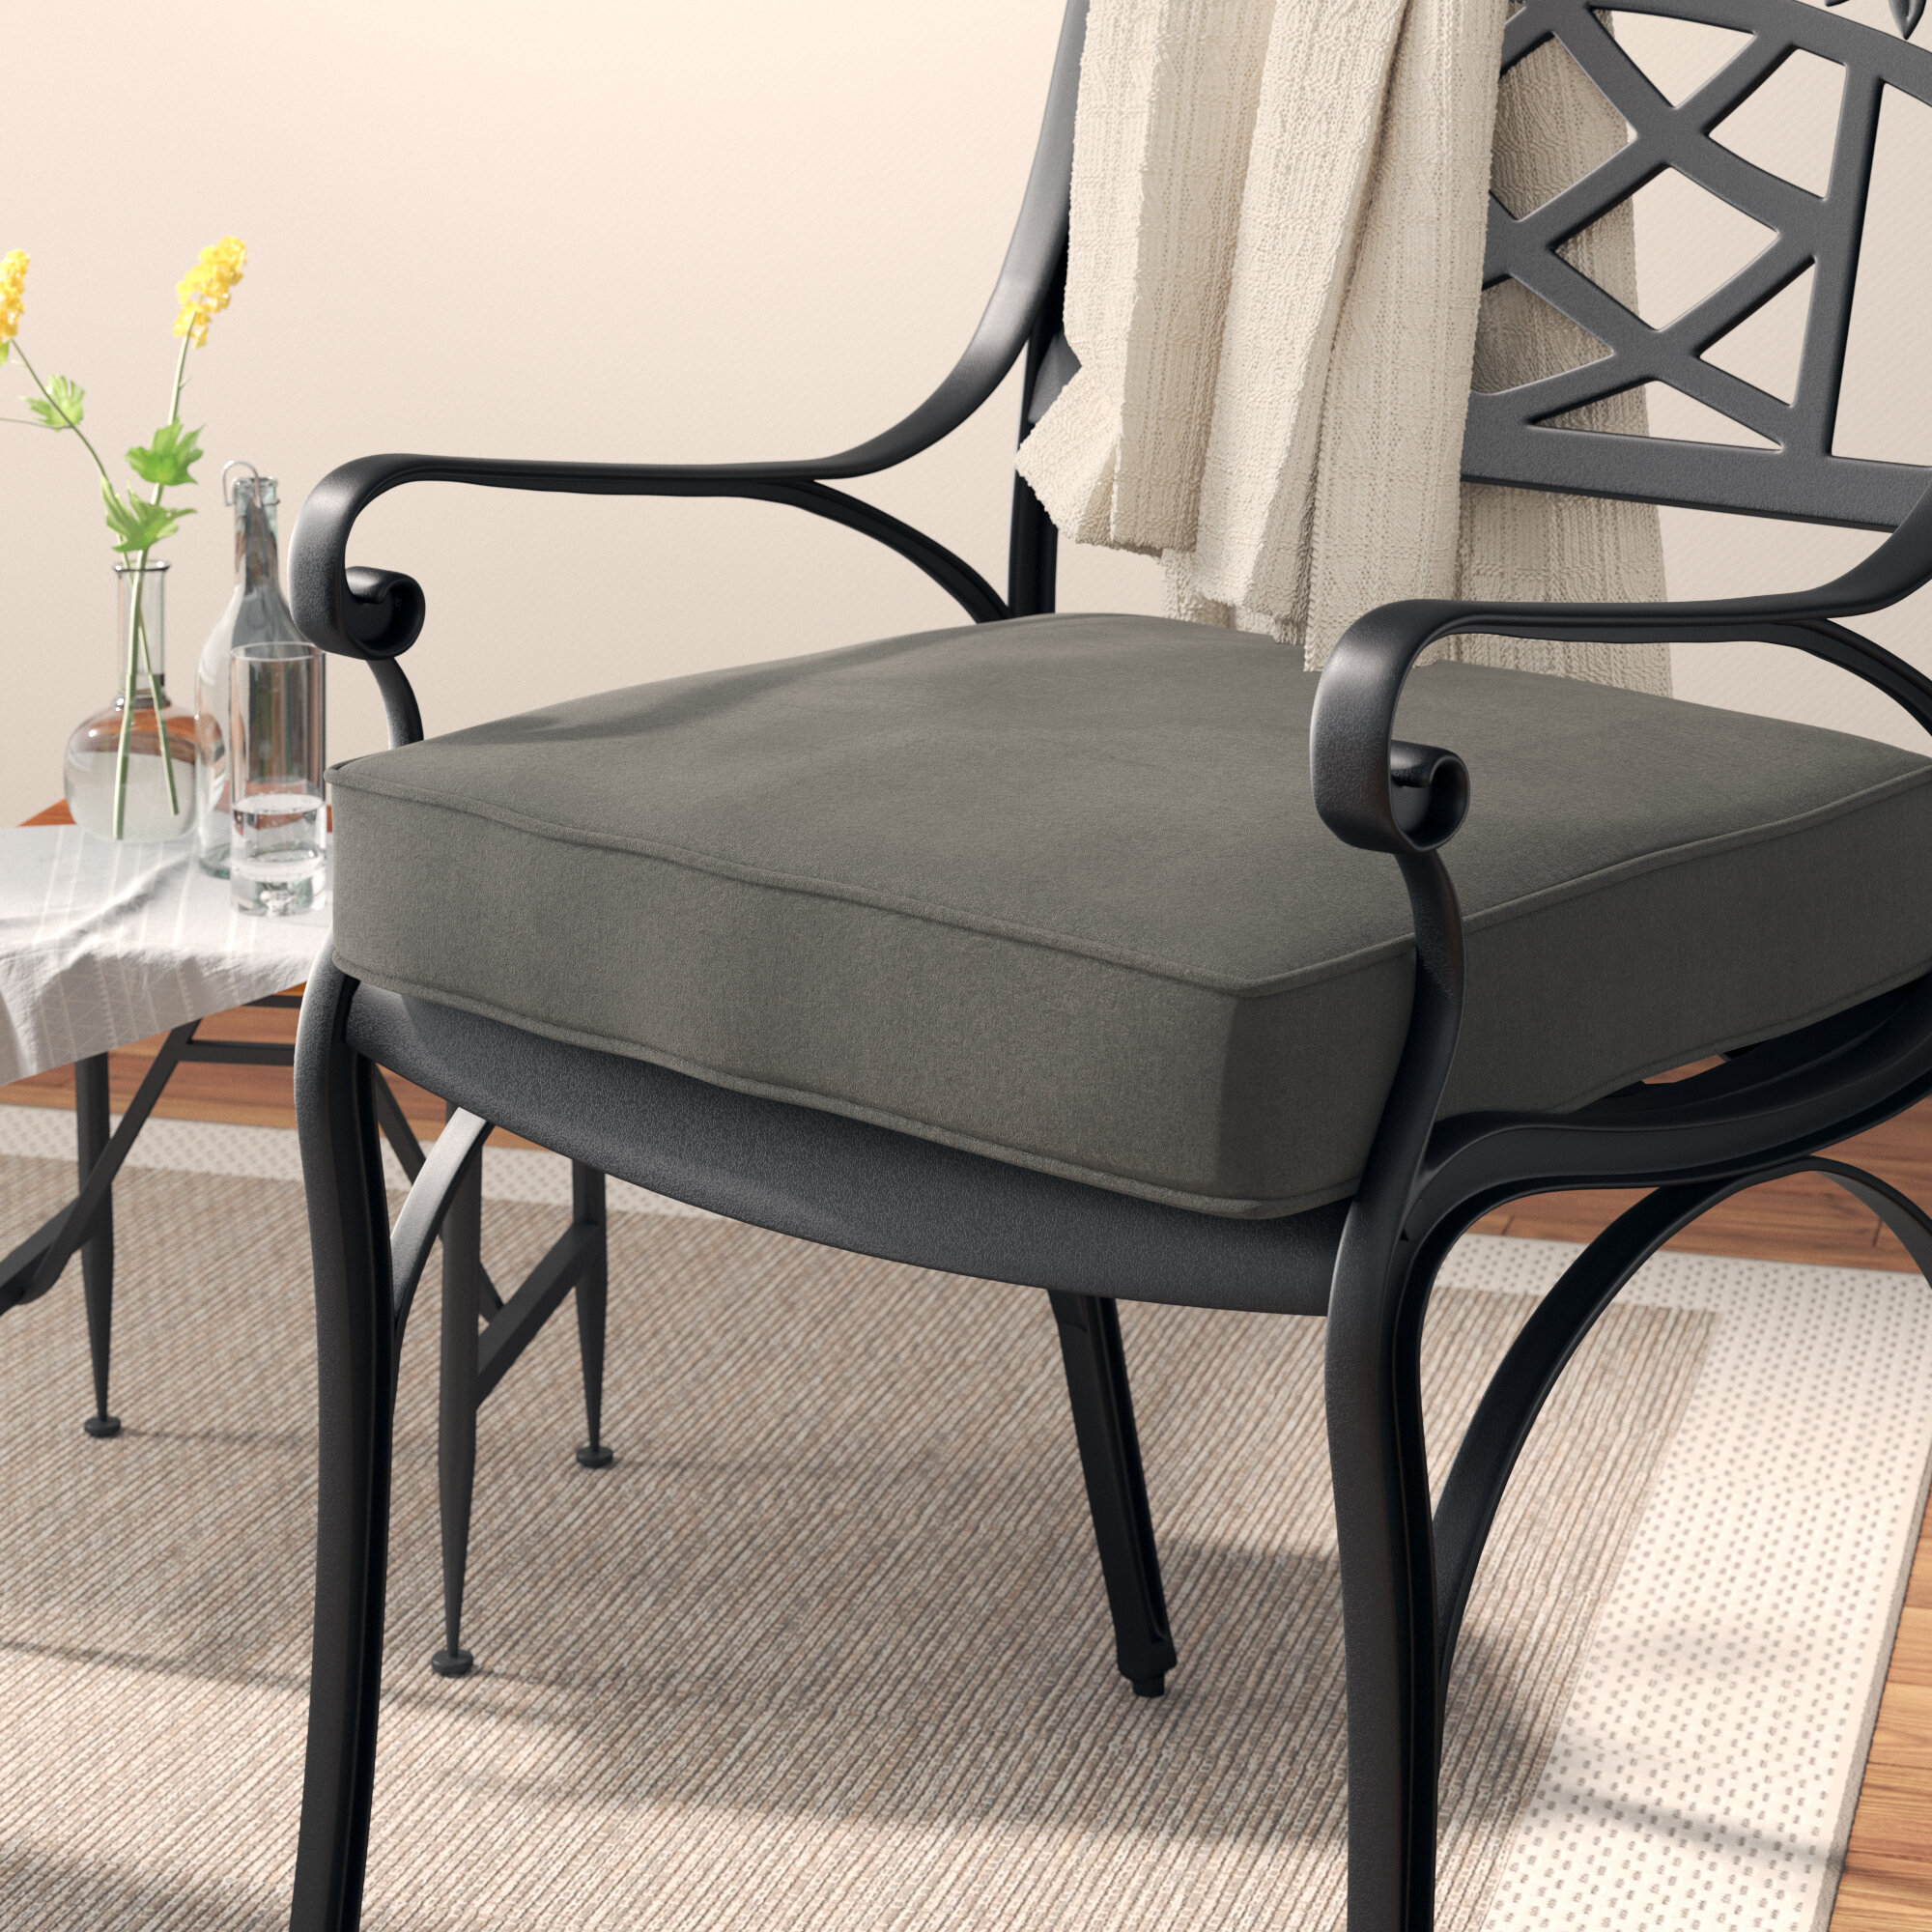 Laurel Foundry Modern Farmhouse Outdoor Sunbrella Dining Chair Cushion Wayfair